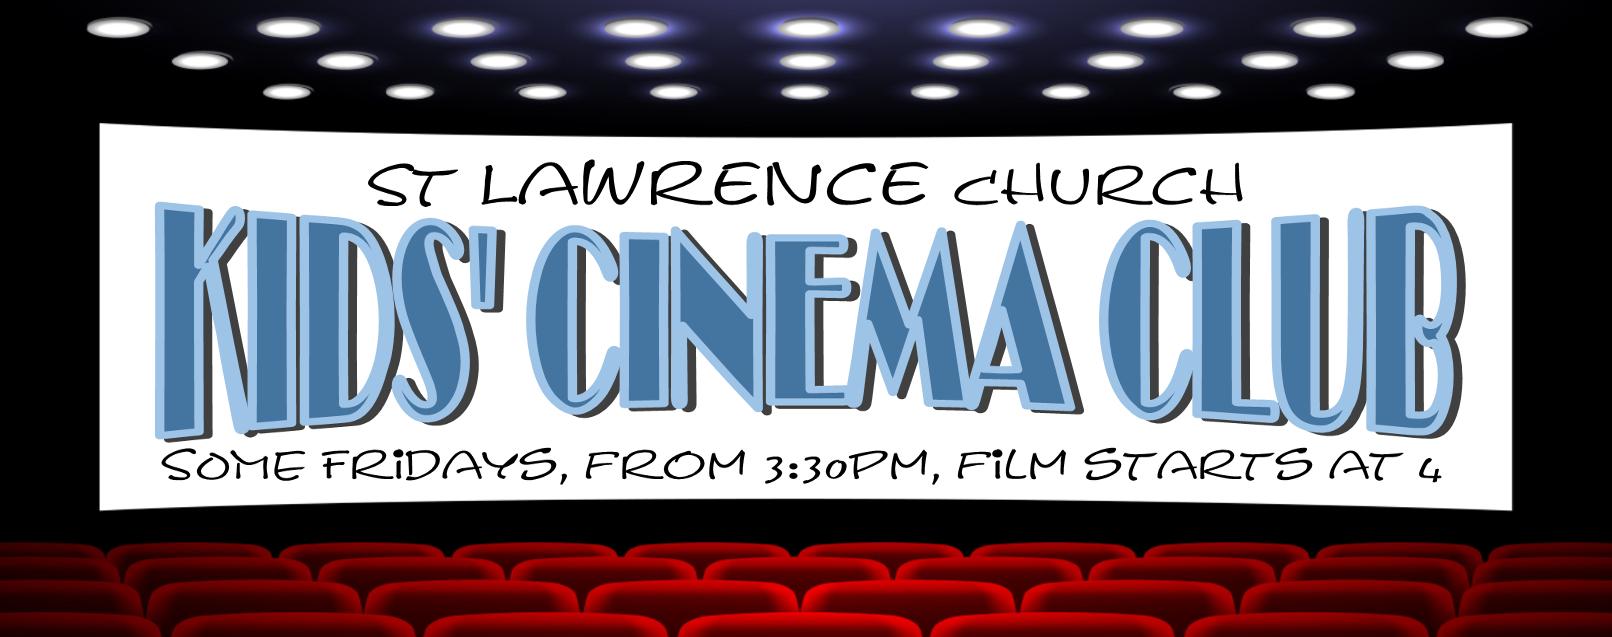 Cinema Club banner